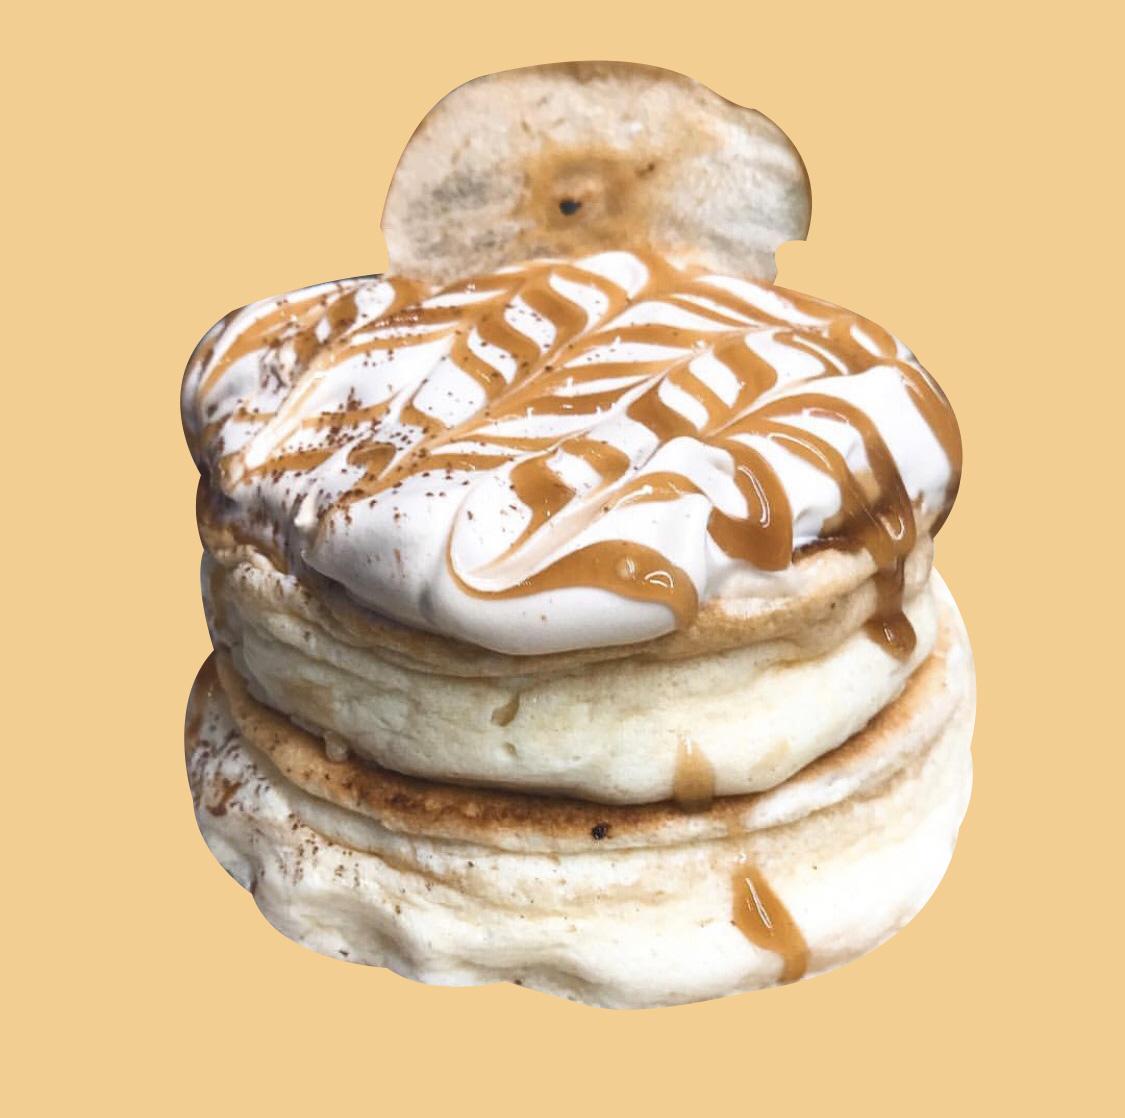 egggcafe  東京都国分寺市本町 2丁目12−4ユーリービル3F